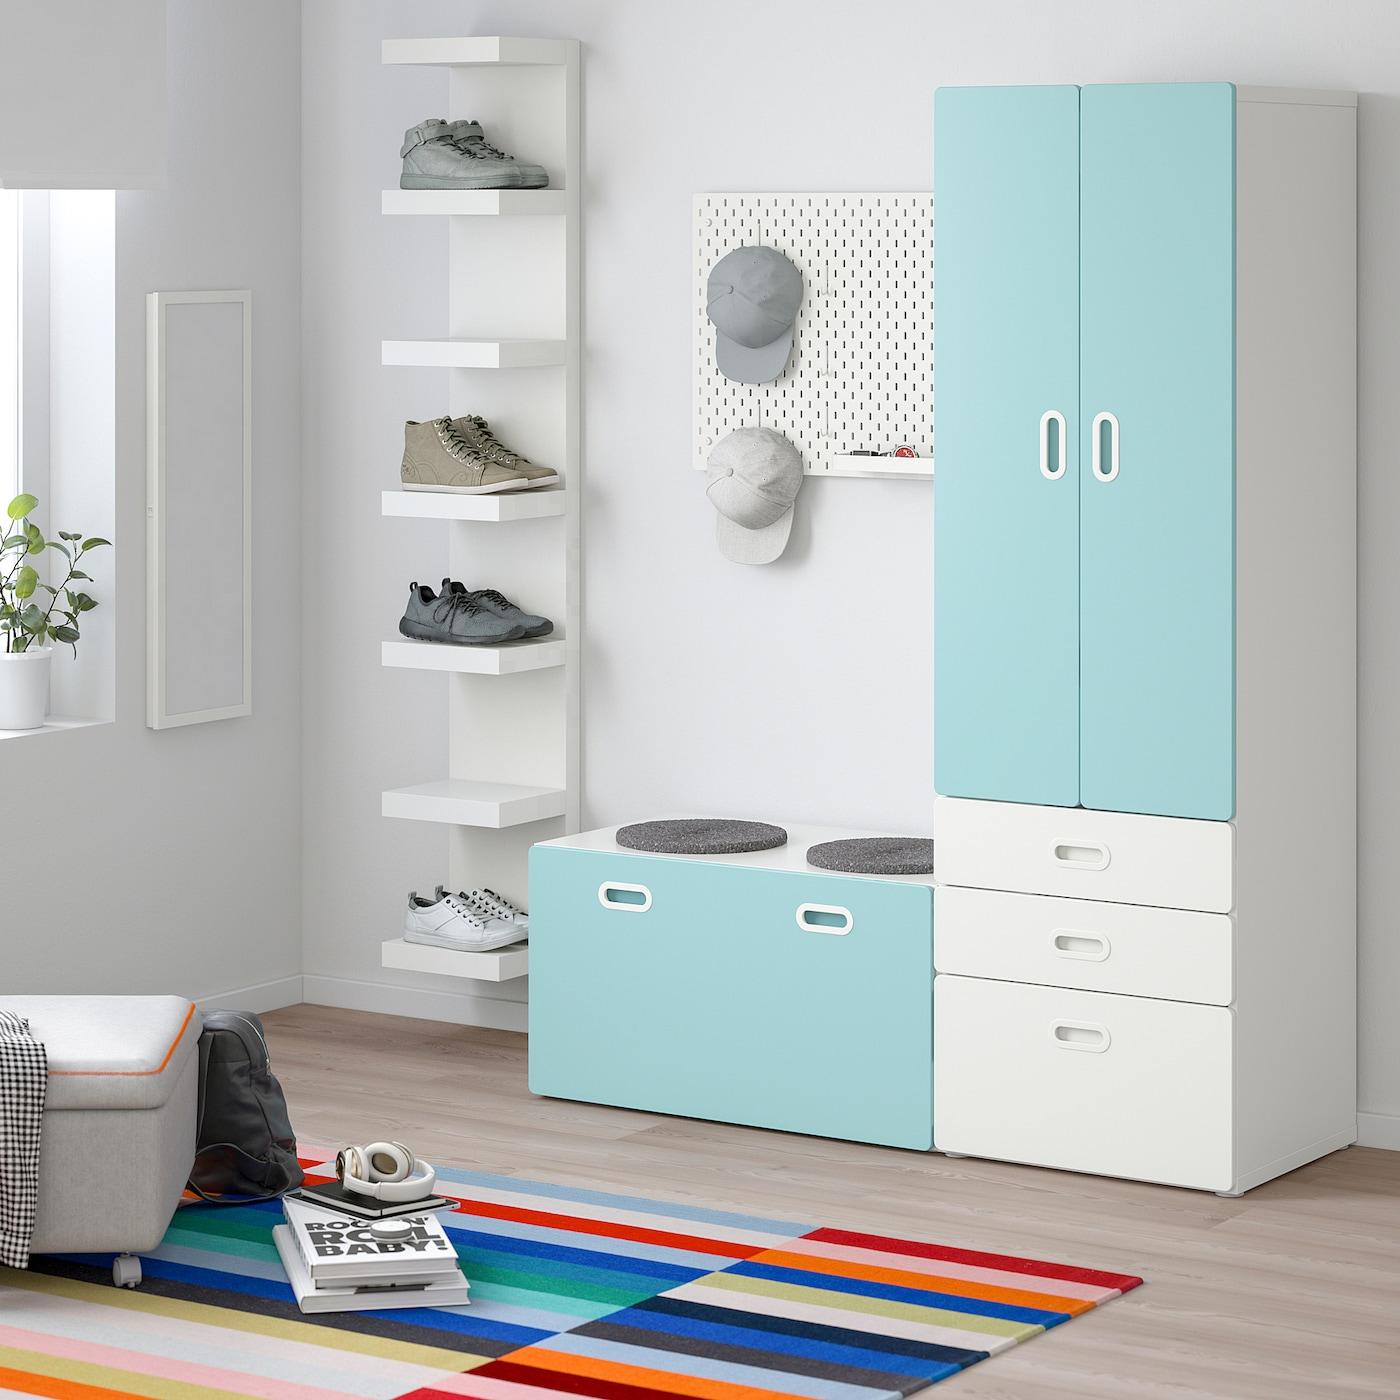 Stuva Fritids Schrank Mit Banktruhe Weiss Hellblau Ikea